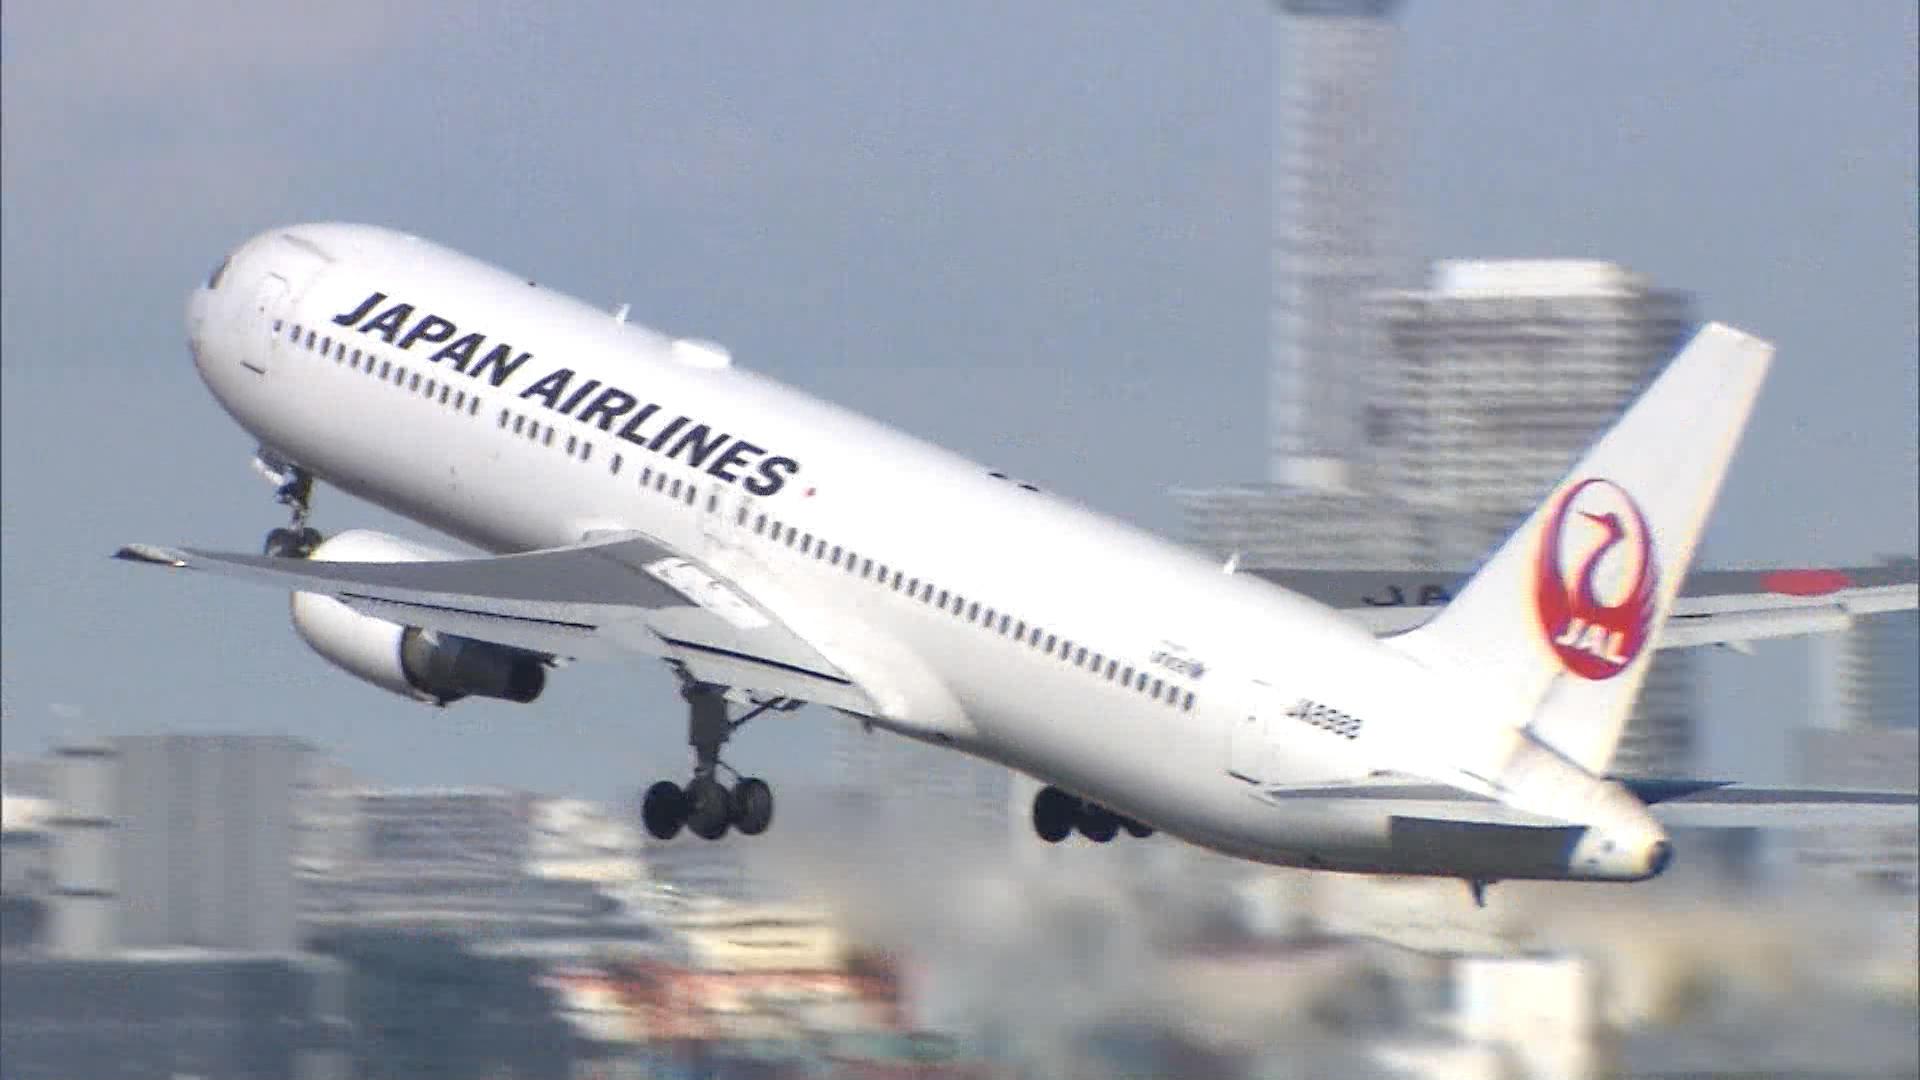 CORONAVIRUS: Japanese airlines to cut domestic flights